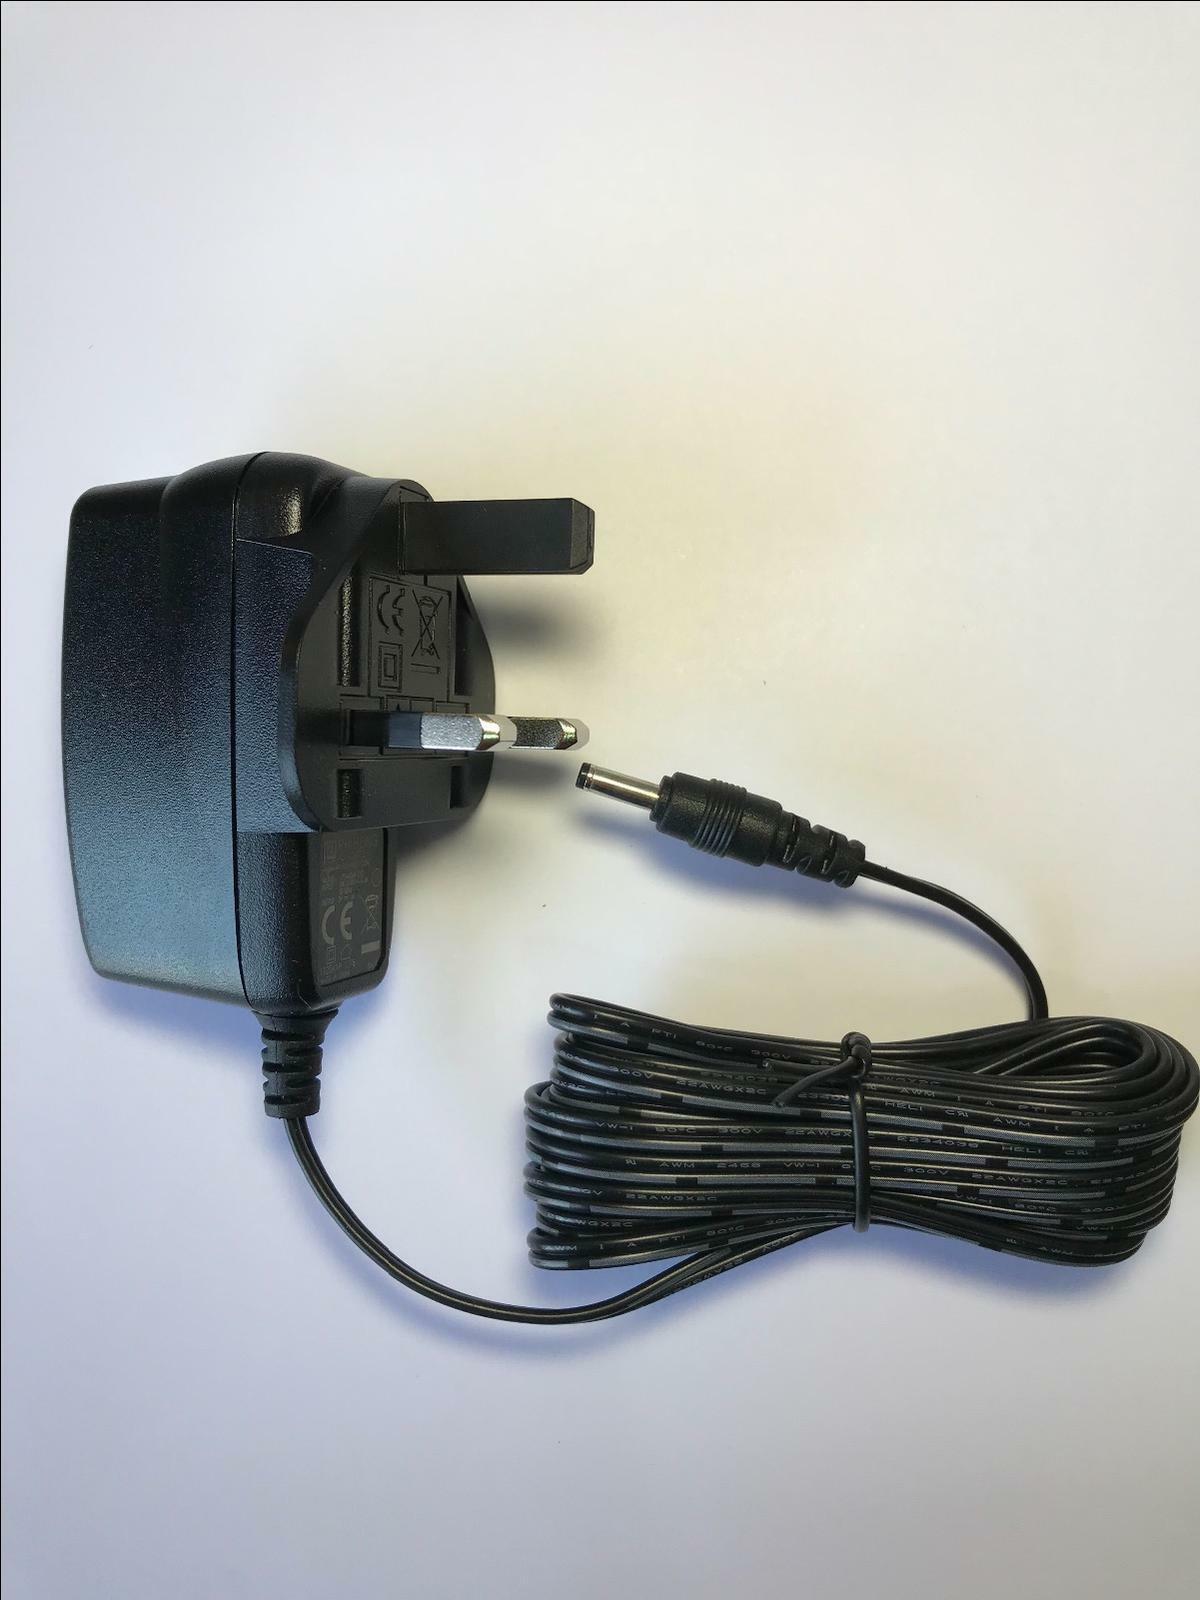 5V AC Adaptor Power Supply for Oregon Scientific BA900 Crystal Weather Station